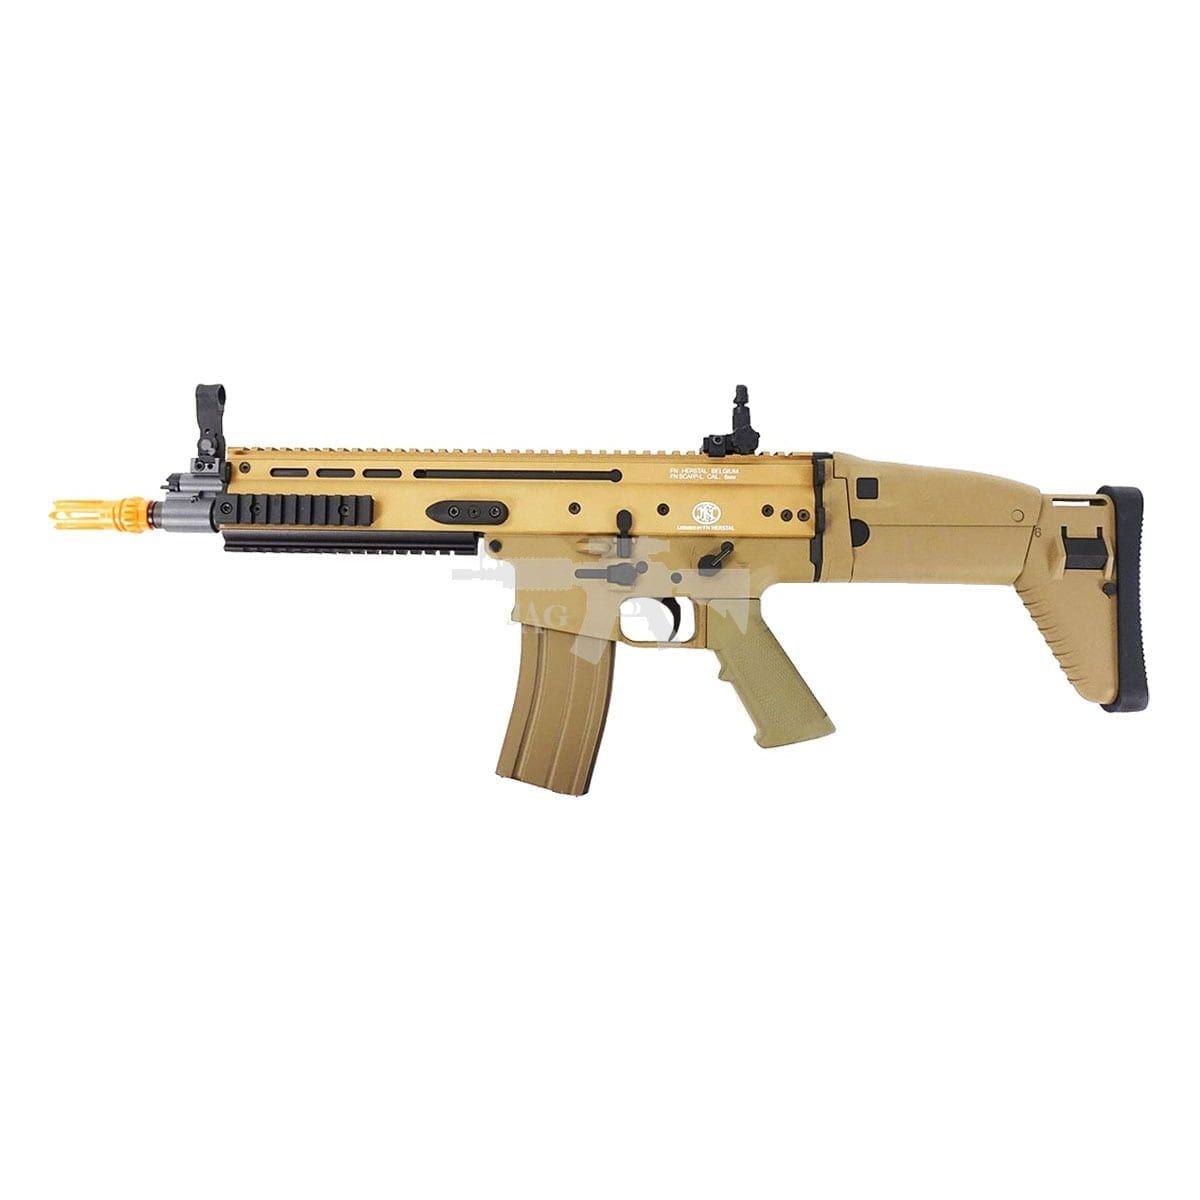 FN HERSTAL SCAR L AIRSOFT ELECTRIC GUN